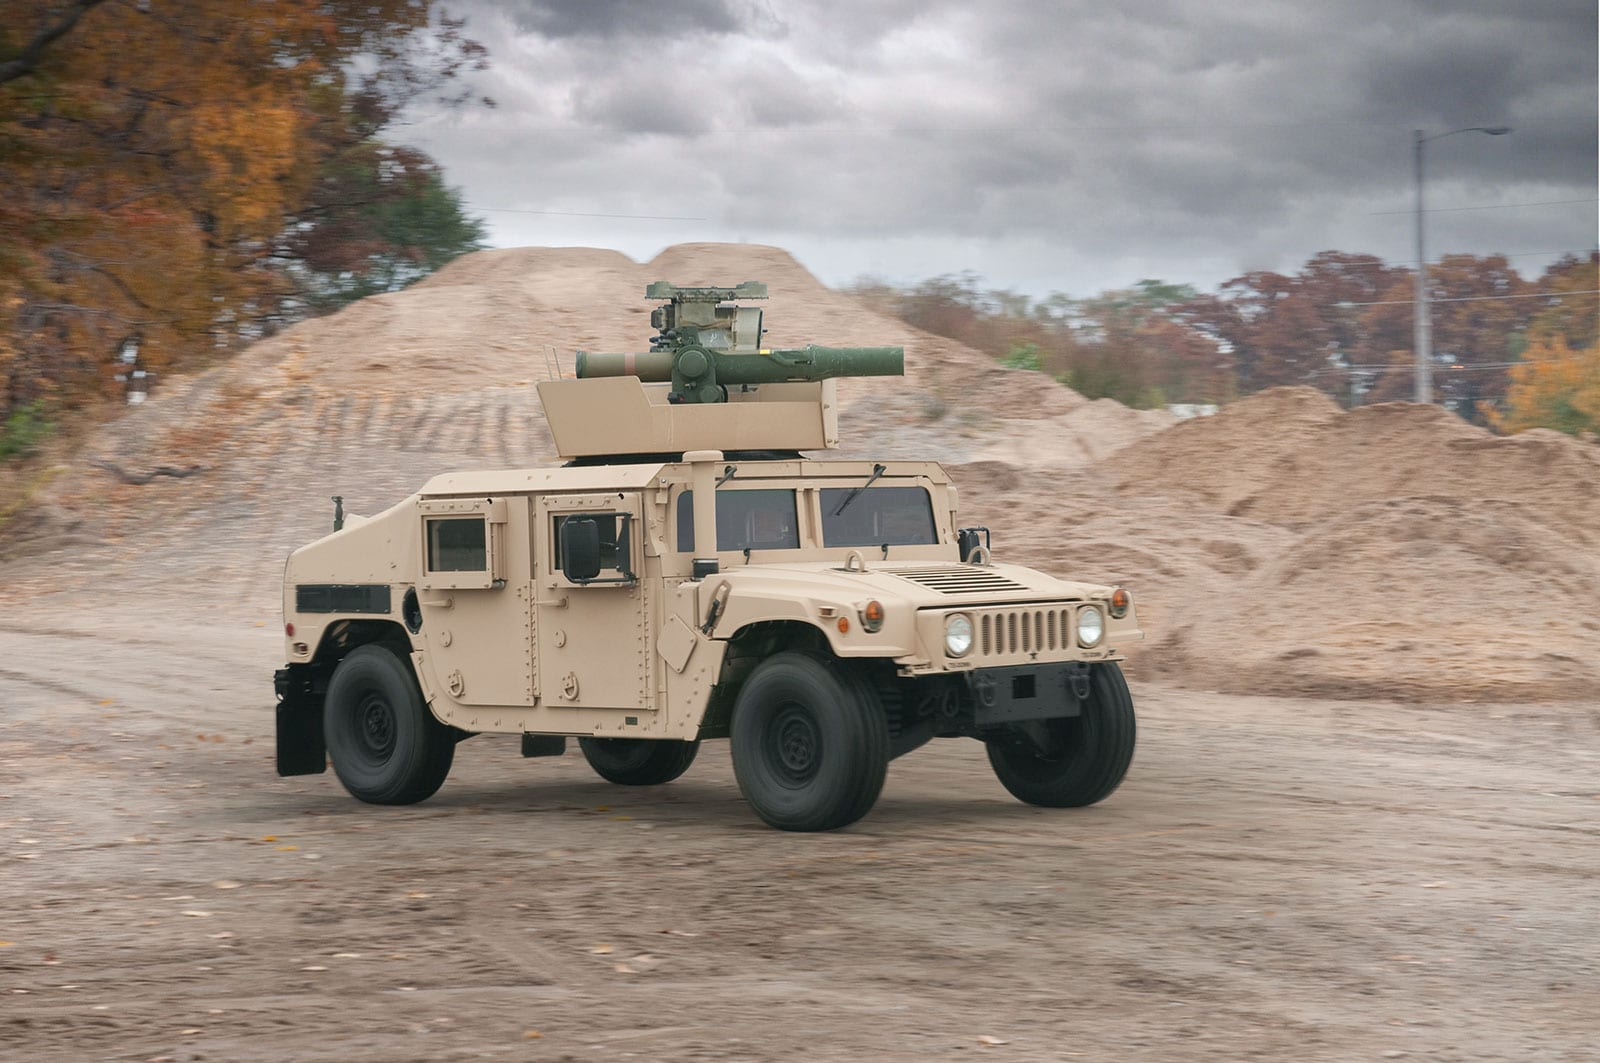 M1167 HMMWV AM GENERAL